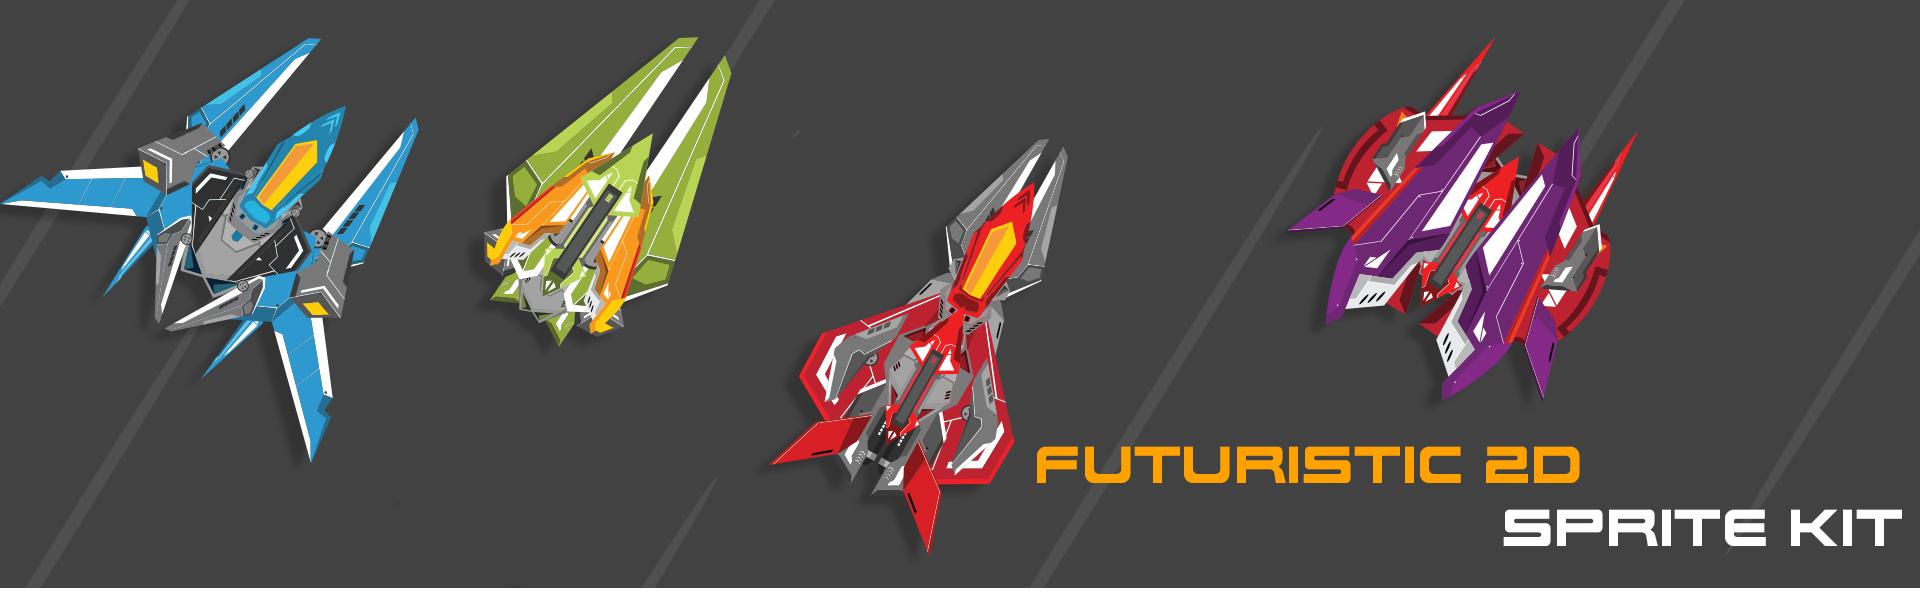 Futuristic 2D Sprite Kit